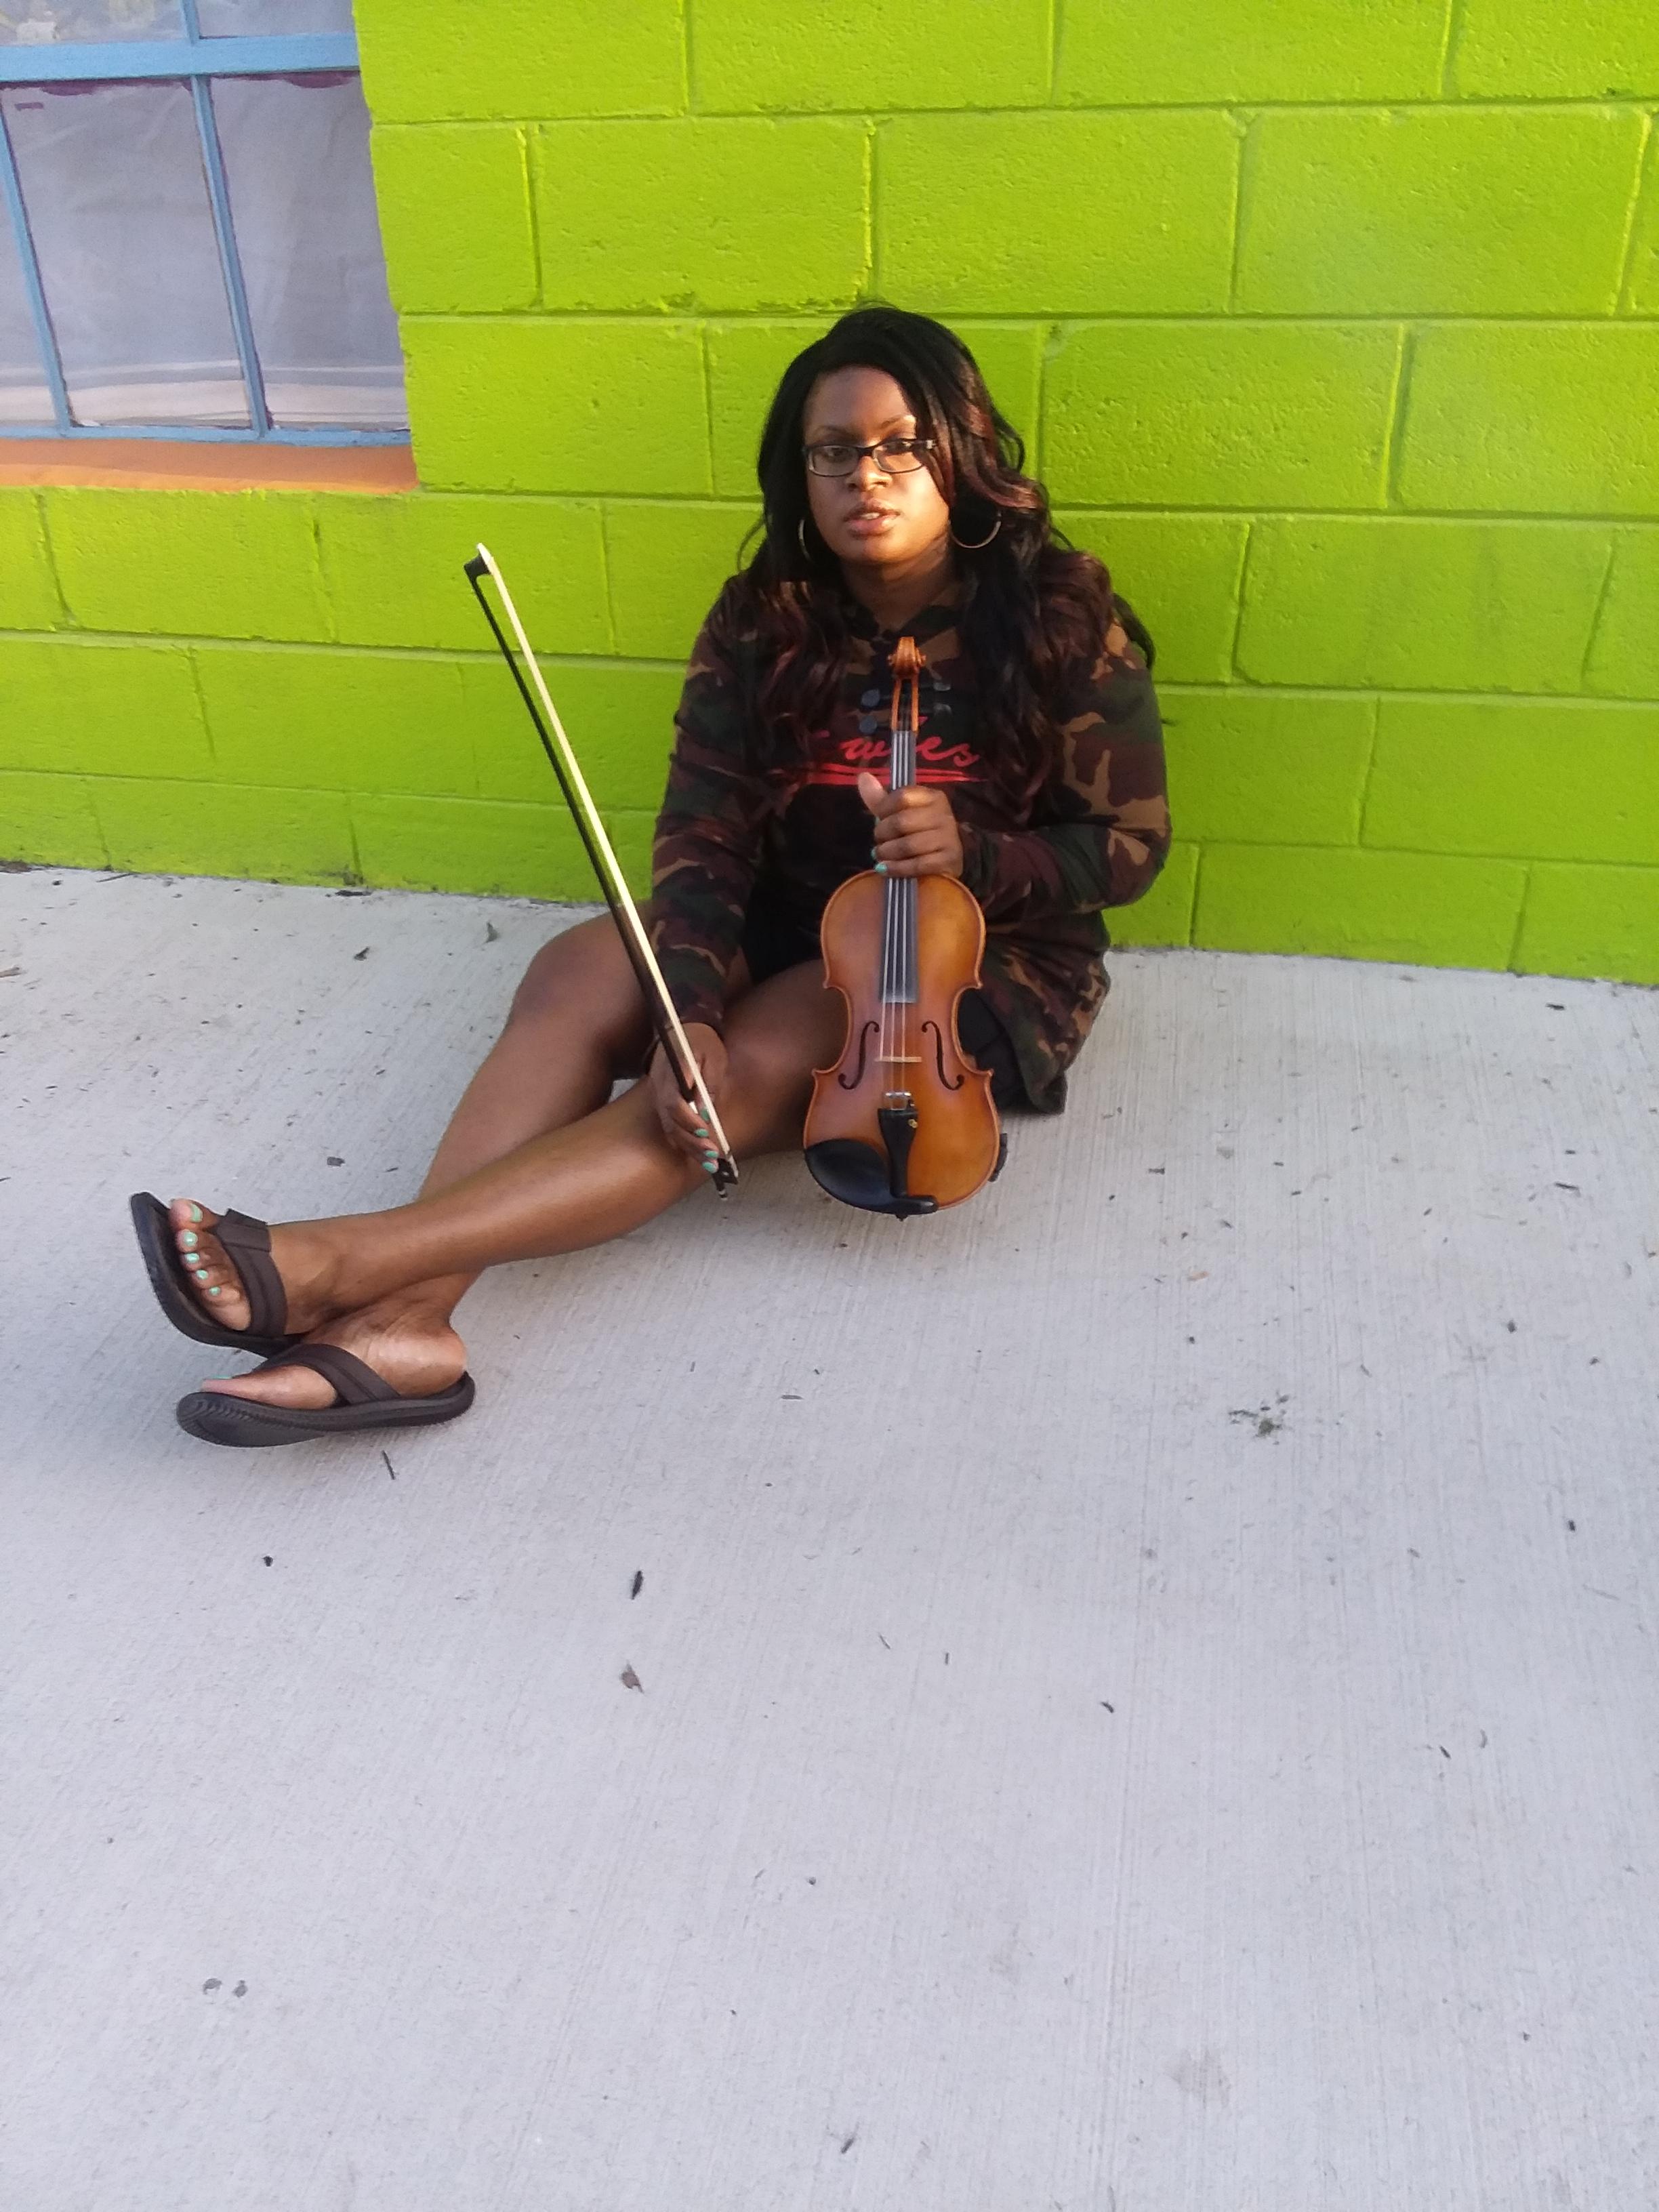 Sai Harley Green Wall Charlotte NC Violinist 7.jpg